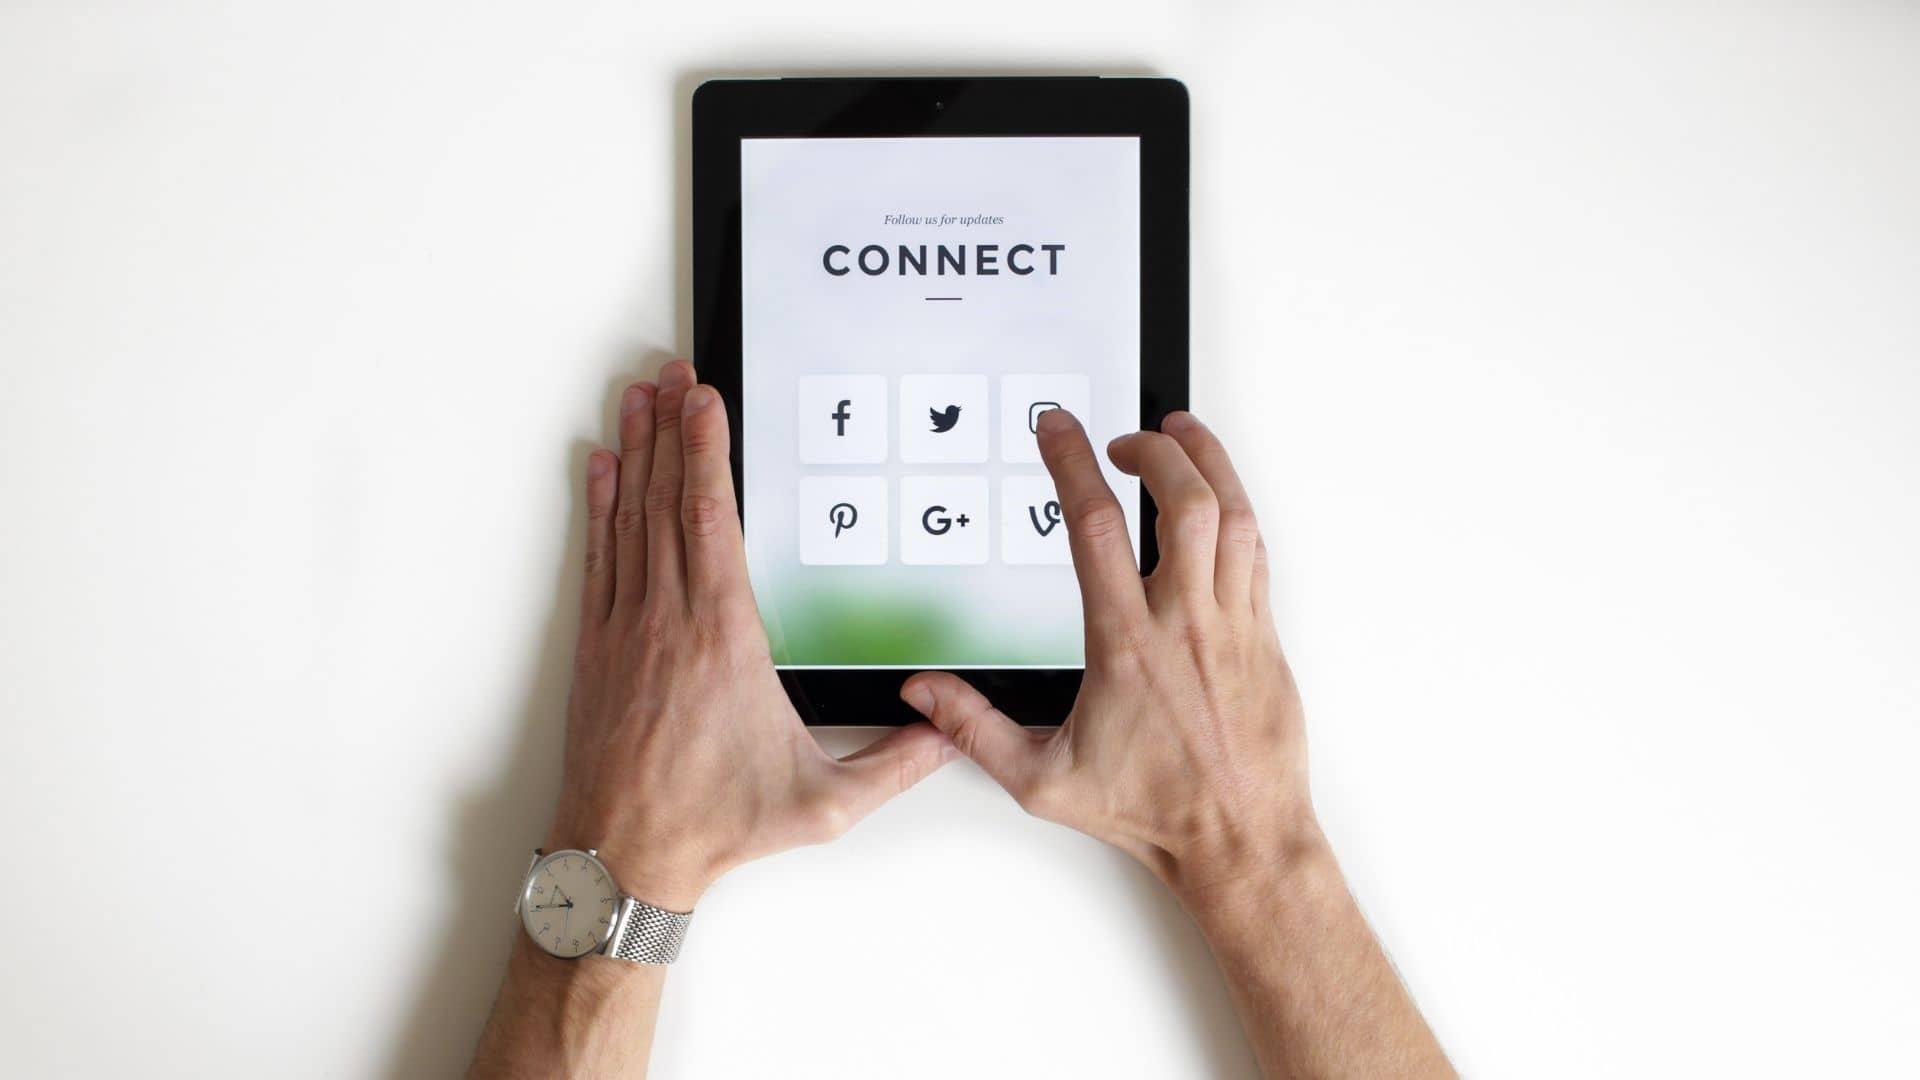 Marketing Ideas, Marketing Strategies, SEO ideas, Marketing Ideas for small business, Marketing Strategies for small business, SEO ideas for small business, social media strategies, social media myths